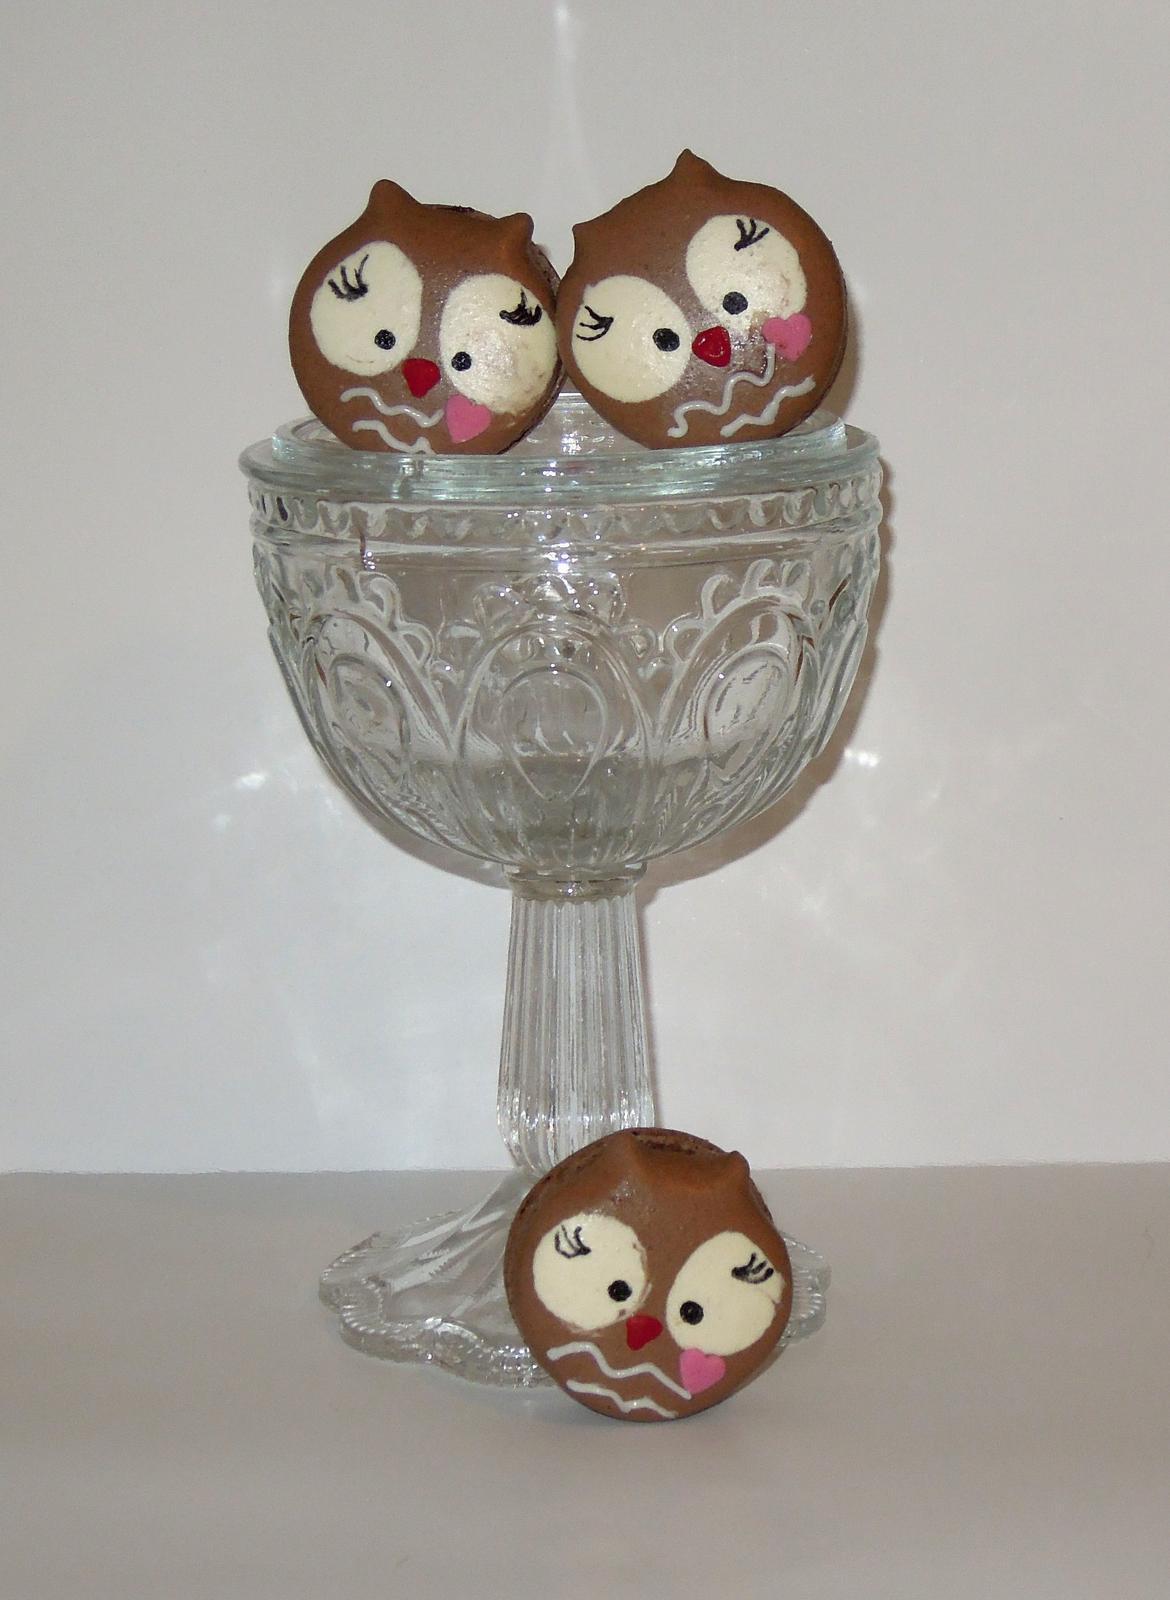 Macarons - Sovicky urobene na poziadavku :-)